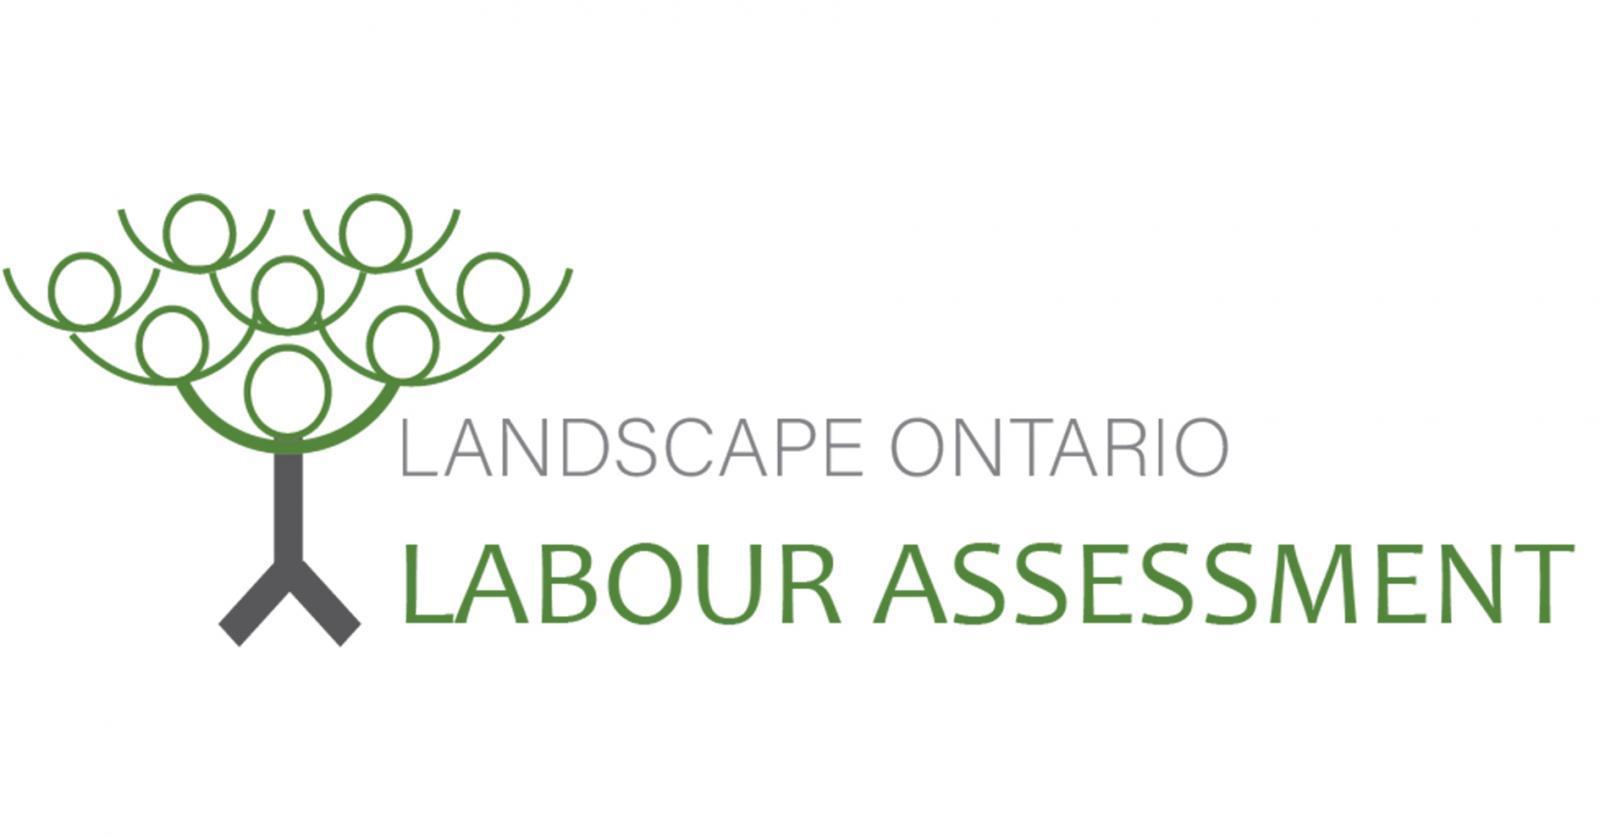 Landscape Ontario Labour Assessment Webinars